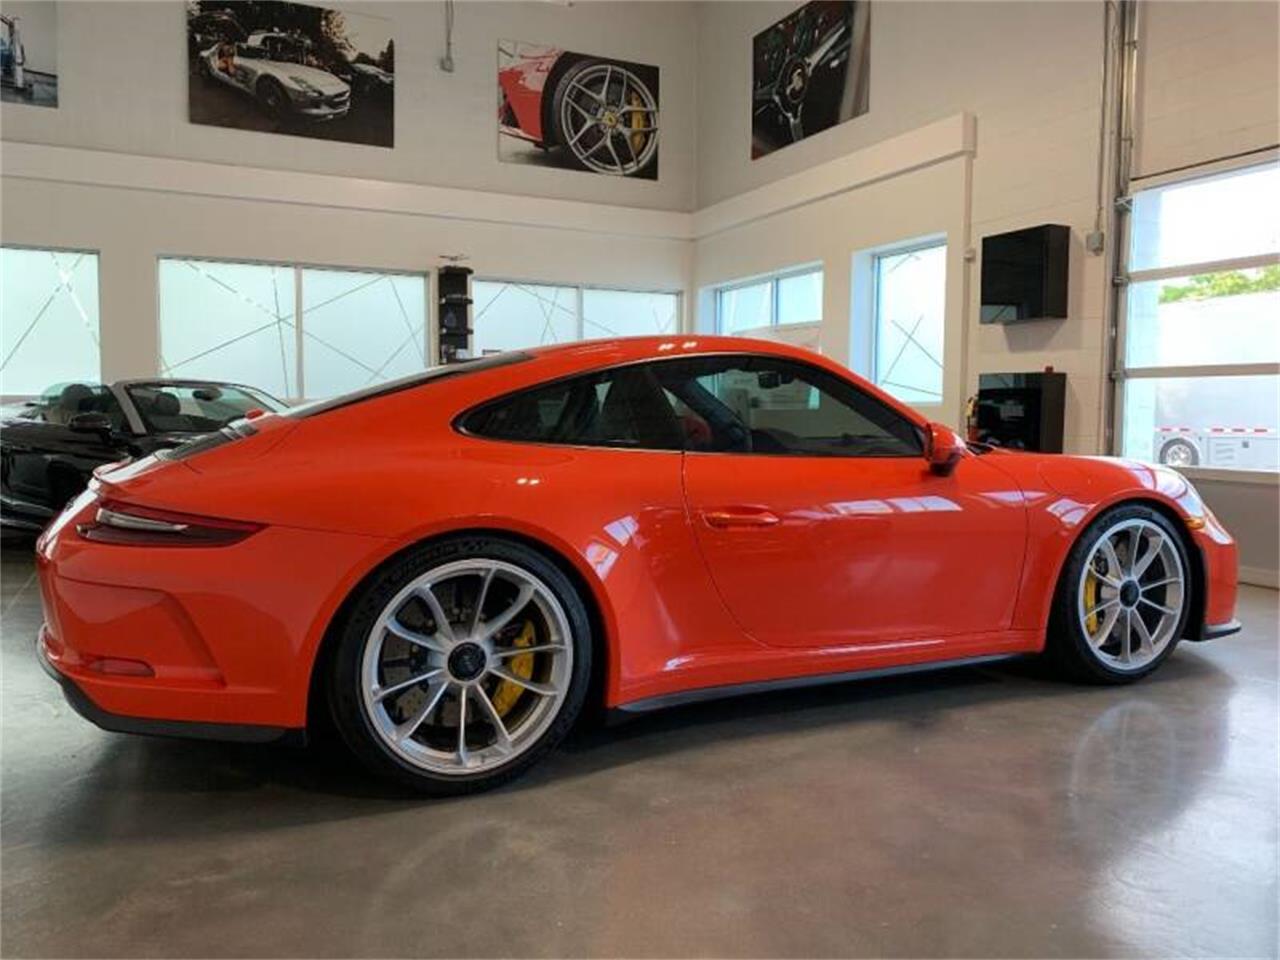 2018 Porsche 911 (CC-1245433) for sale in South Salt Lake, Utah